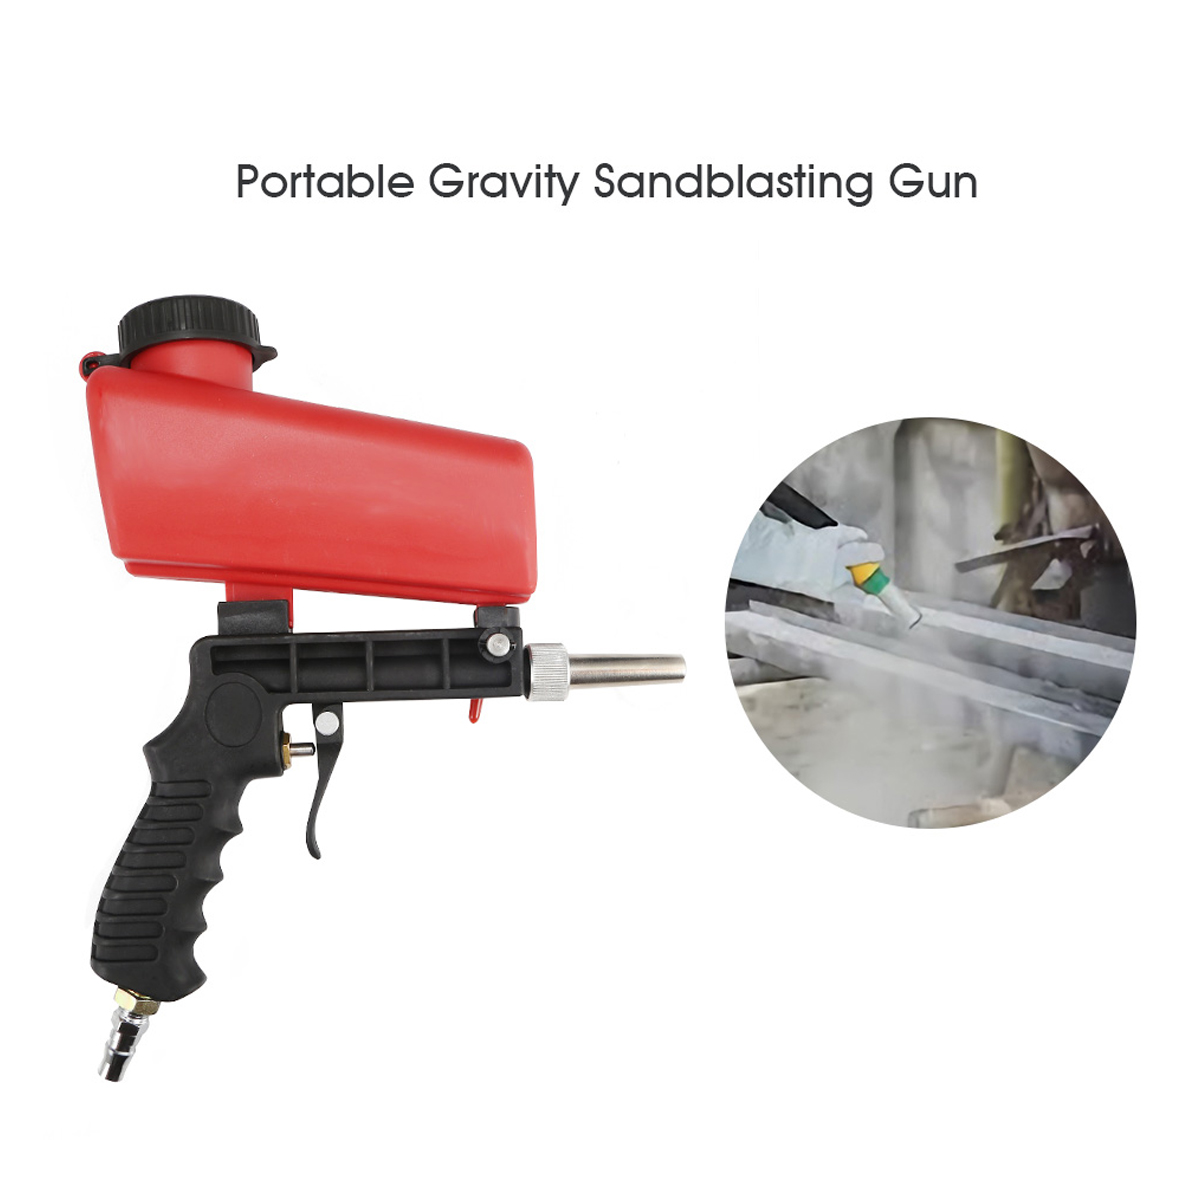 Image 4 - 90psi Portable Gravity Sandblasting Guns Aluminium Pneumatic Sandblaster Spray Guns Sand Removal Blasting Power MachineSpray Guns   -